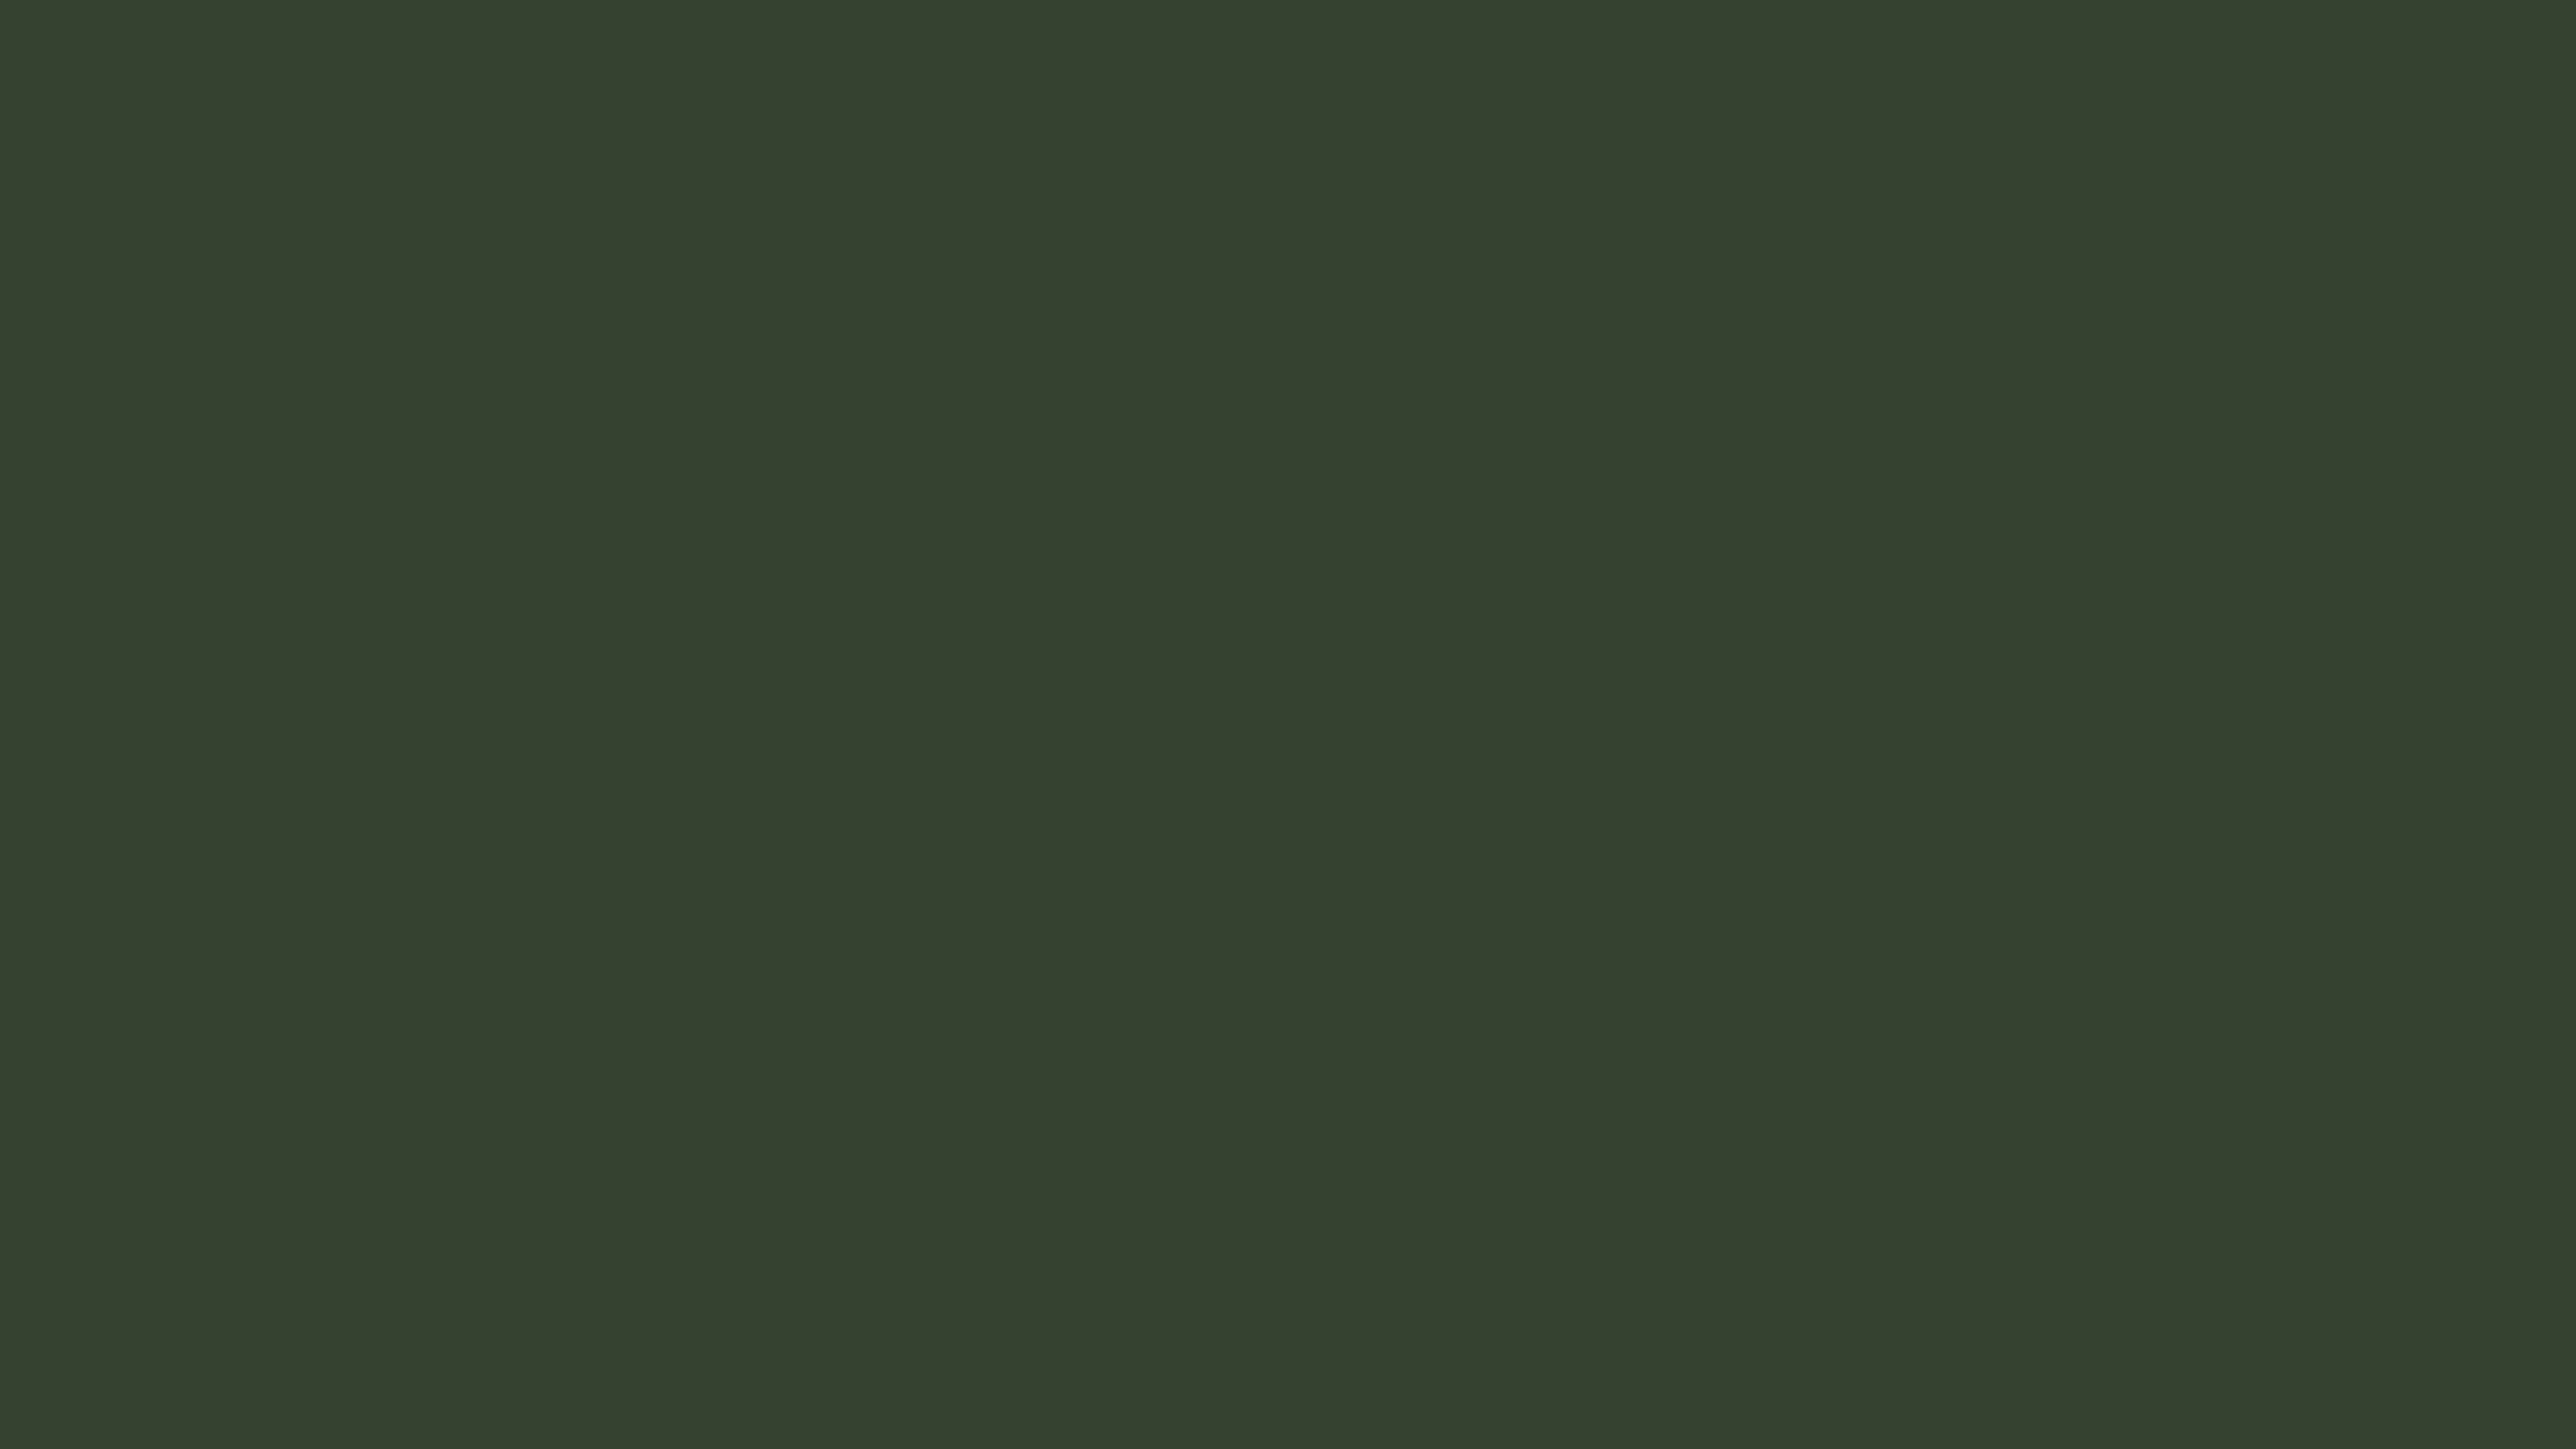 5120x2880 Kombu Green Solid Color Background